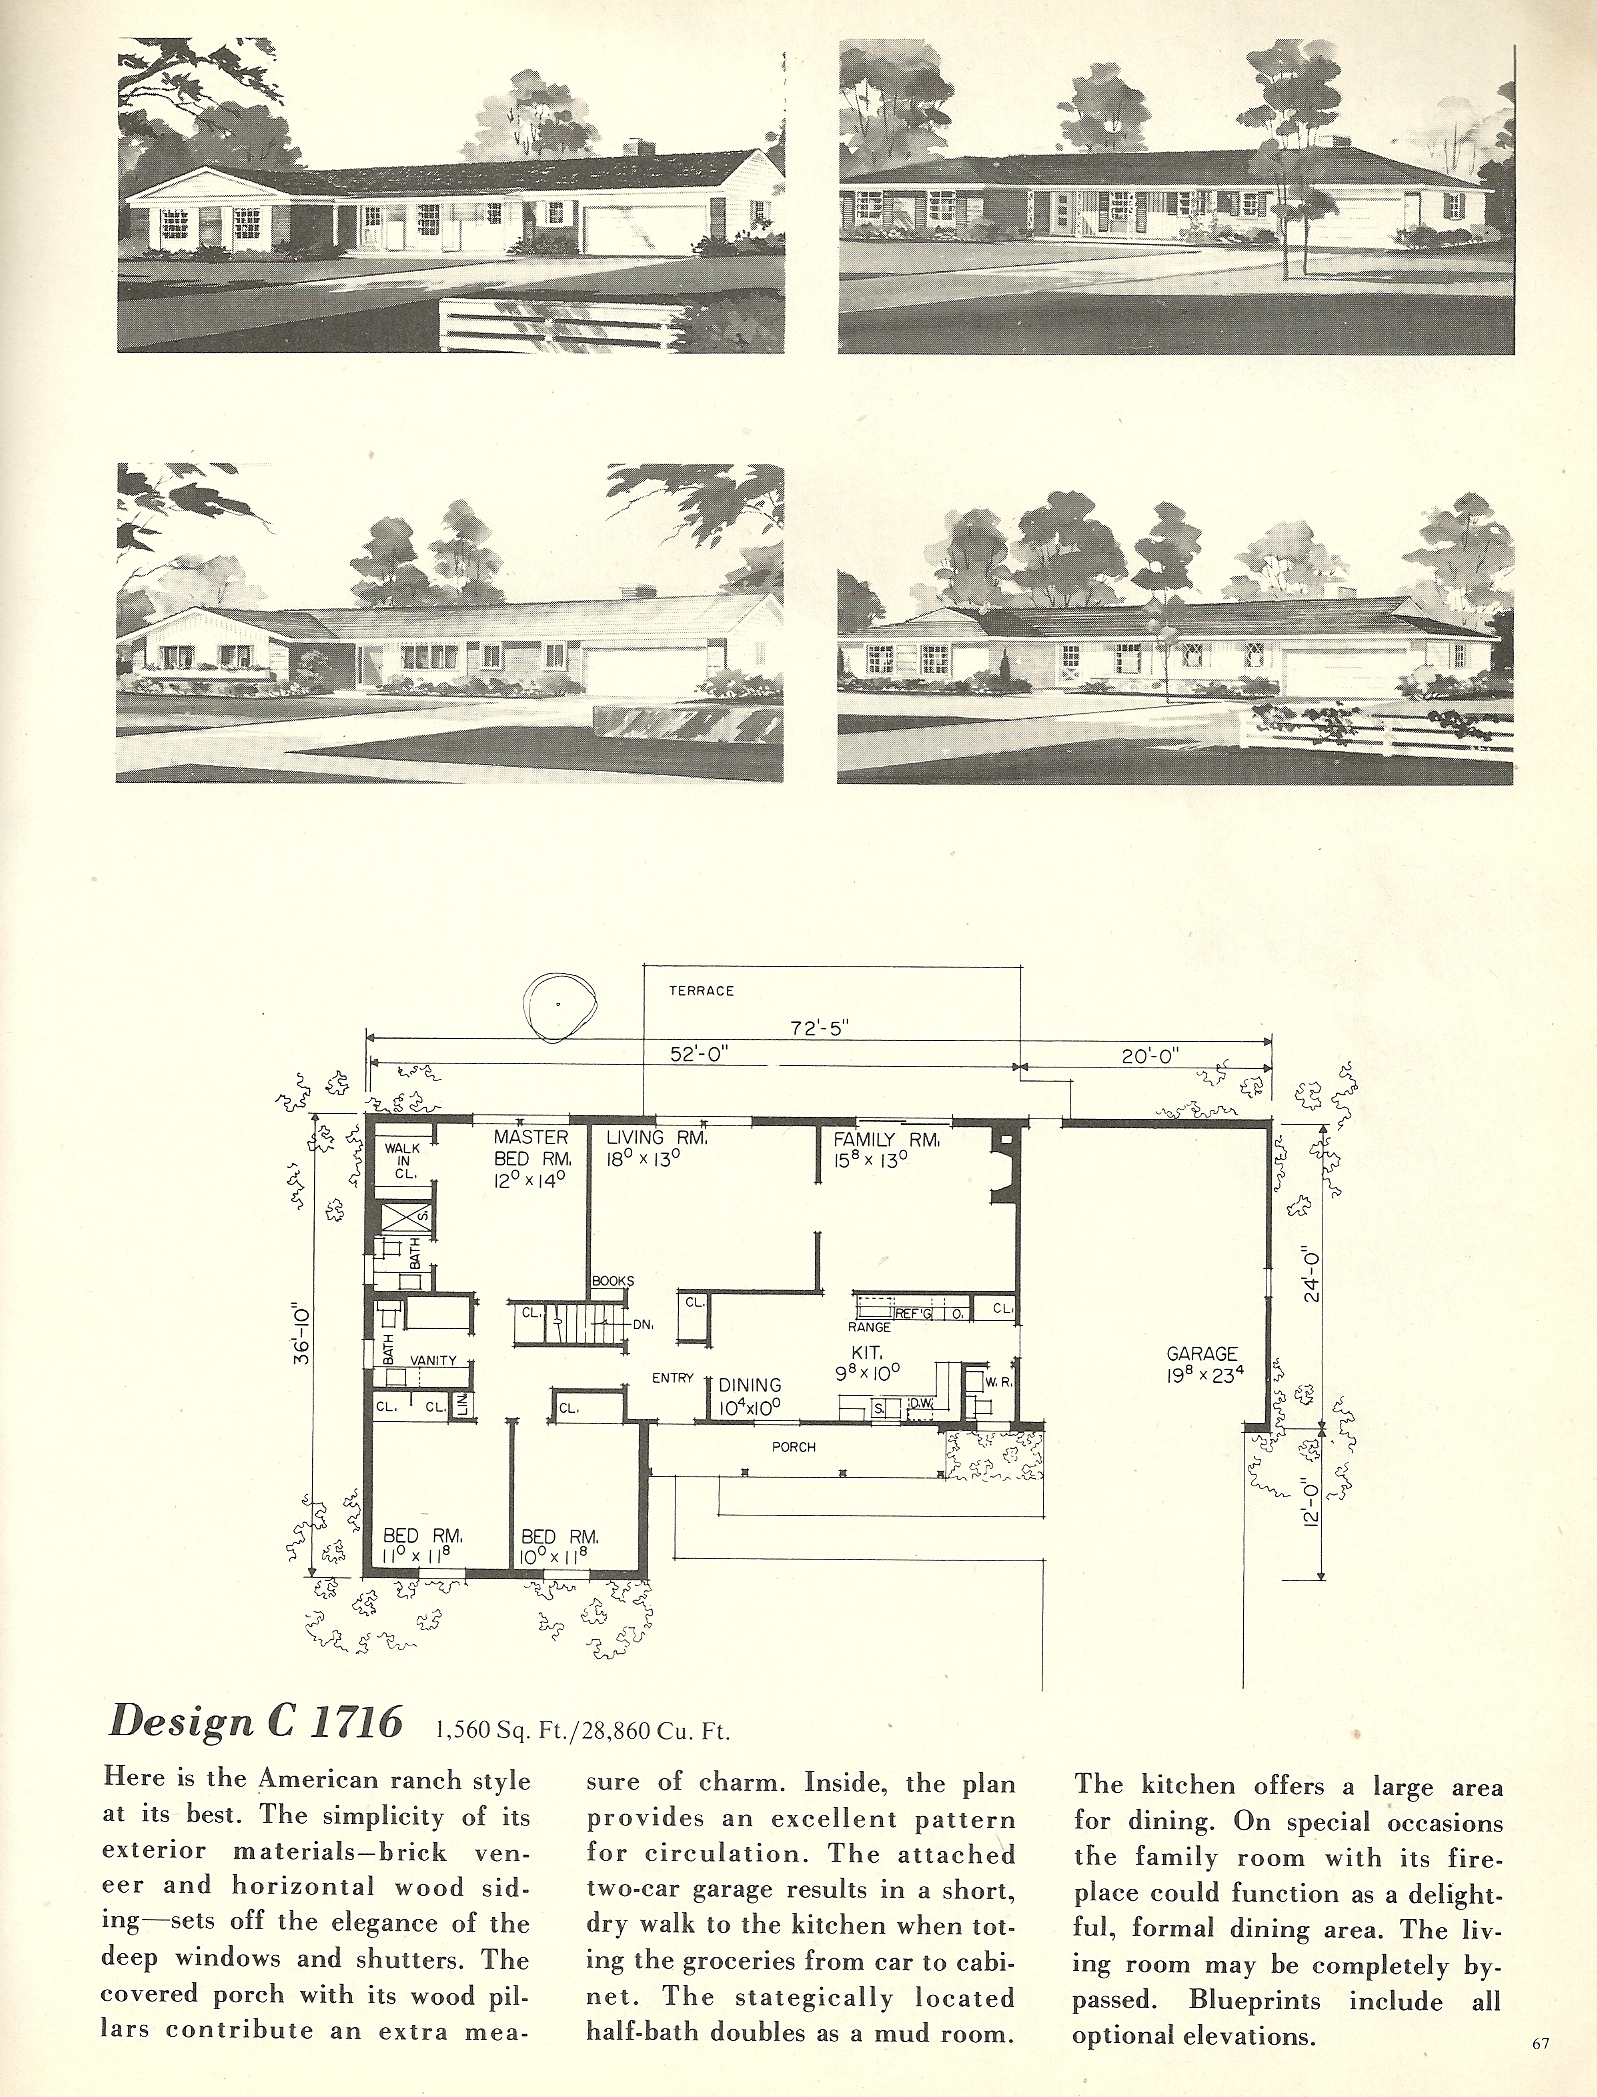 Vintage house plans 1716 antique alter ego for 1960s home floor plans